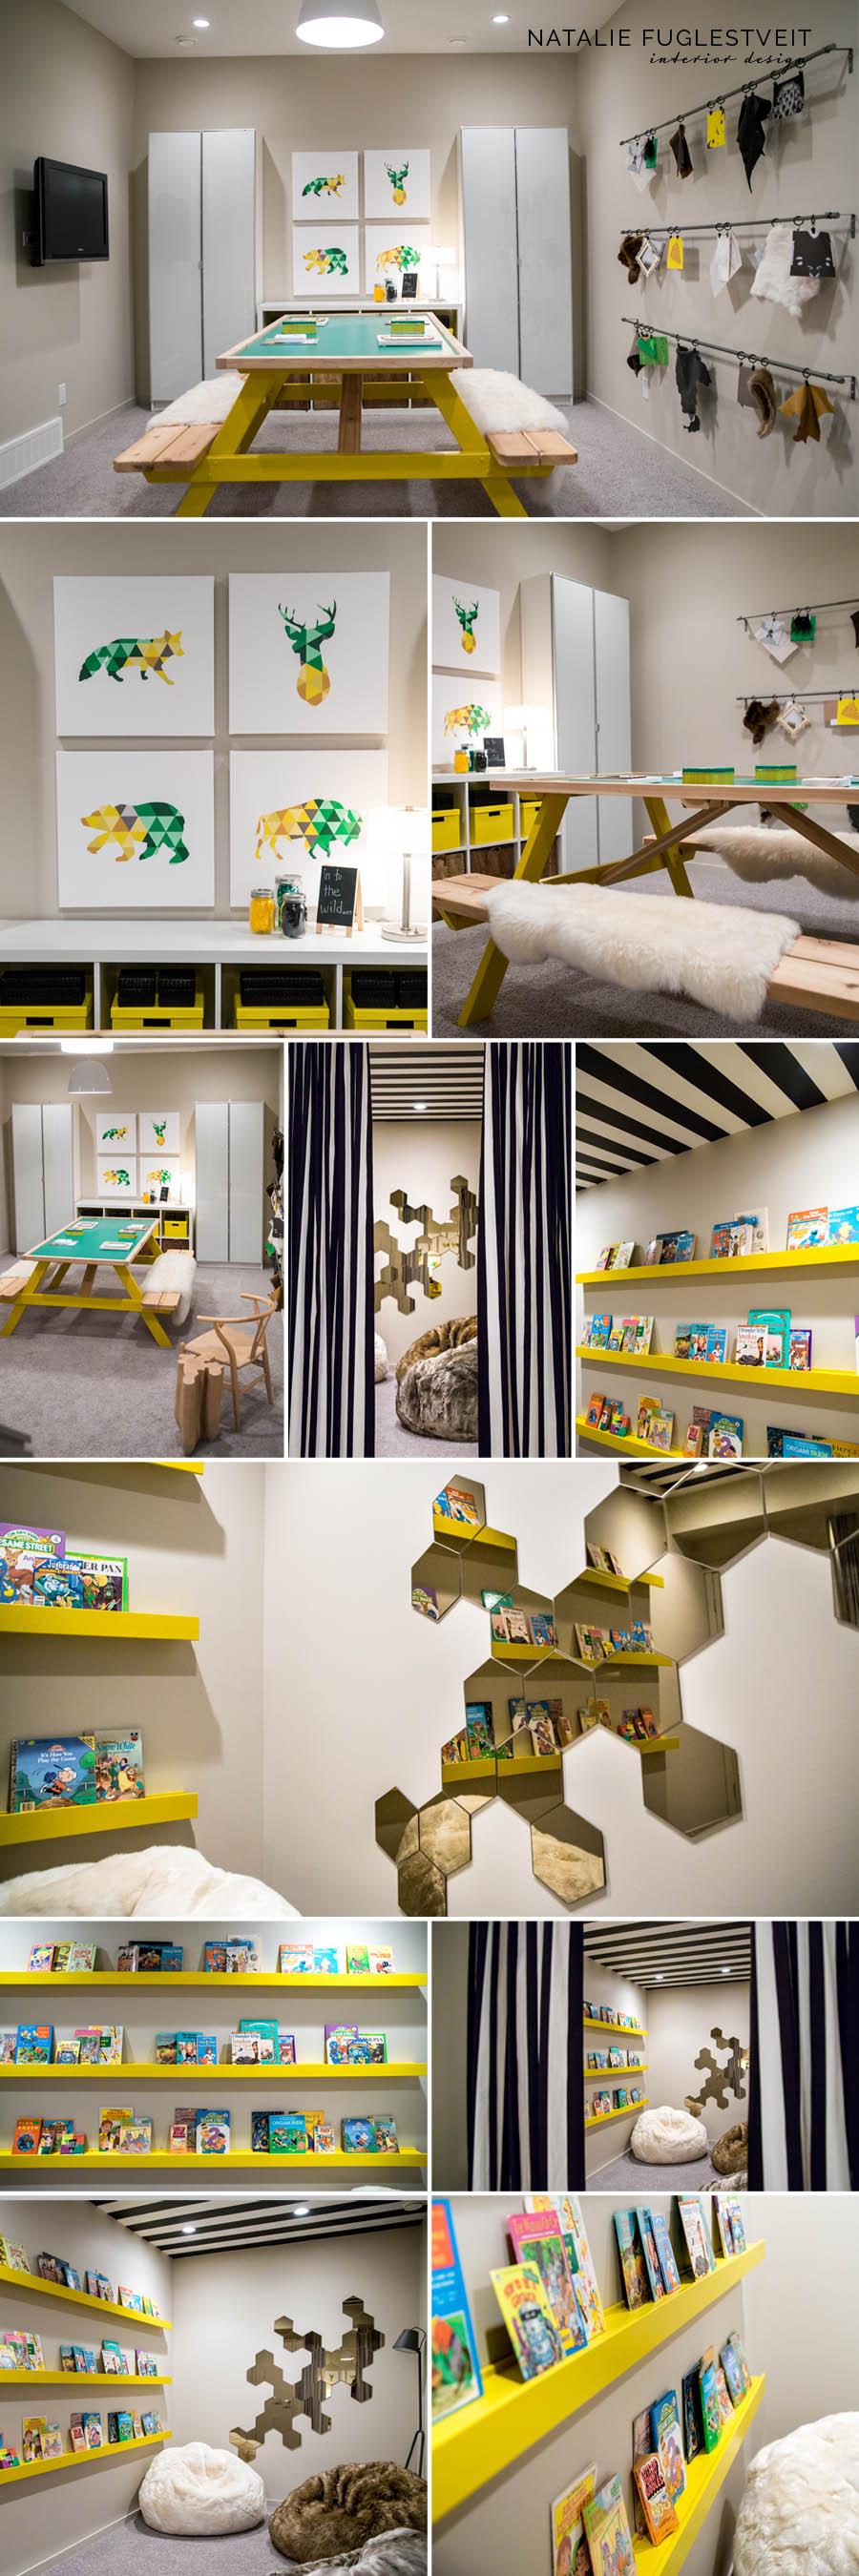 Amazing Kids Play Room in Basement by Calgary Interior Designer